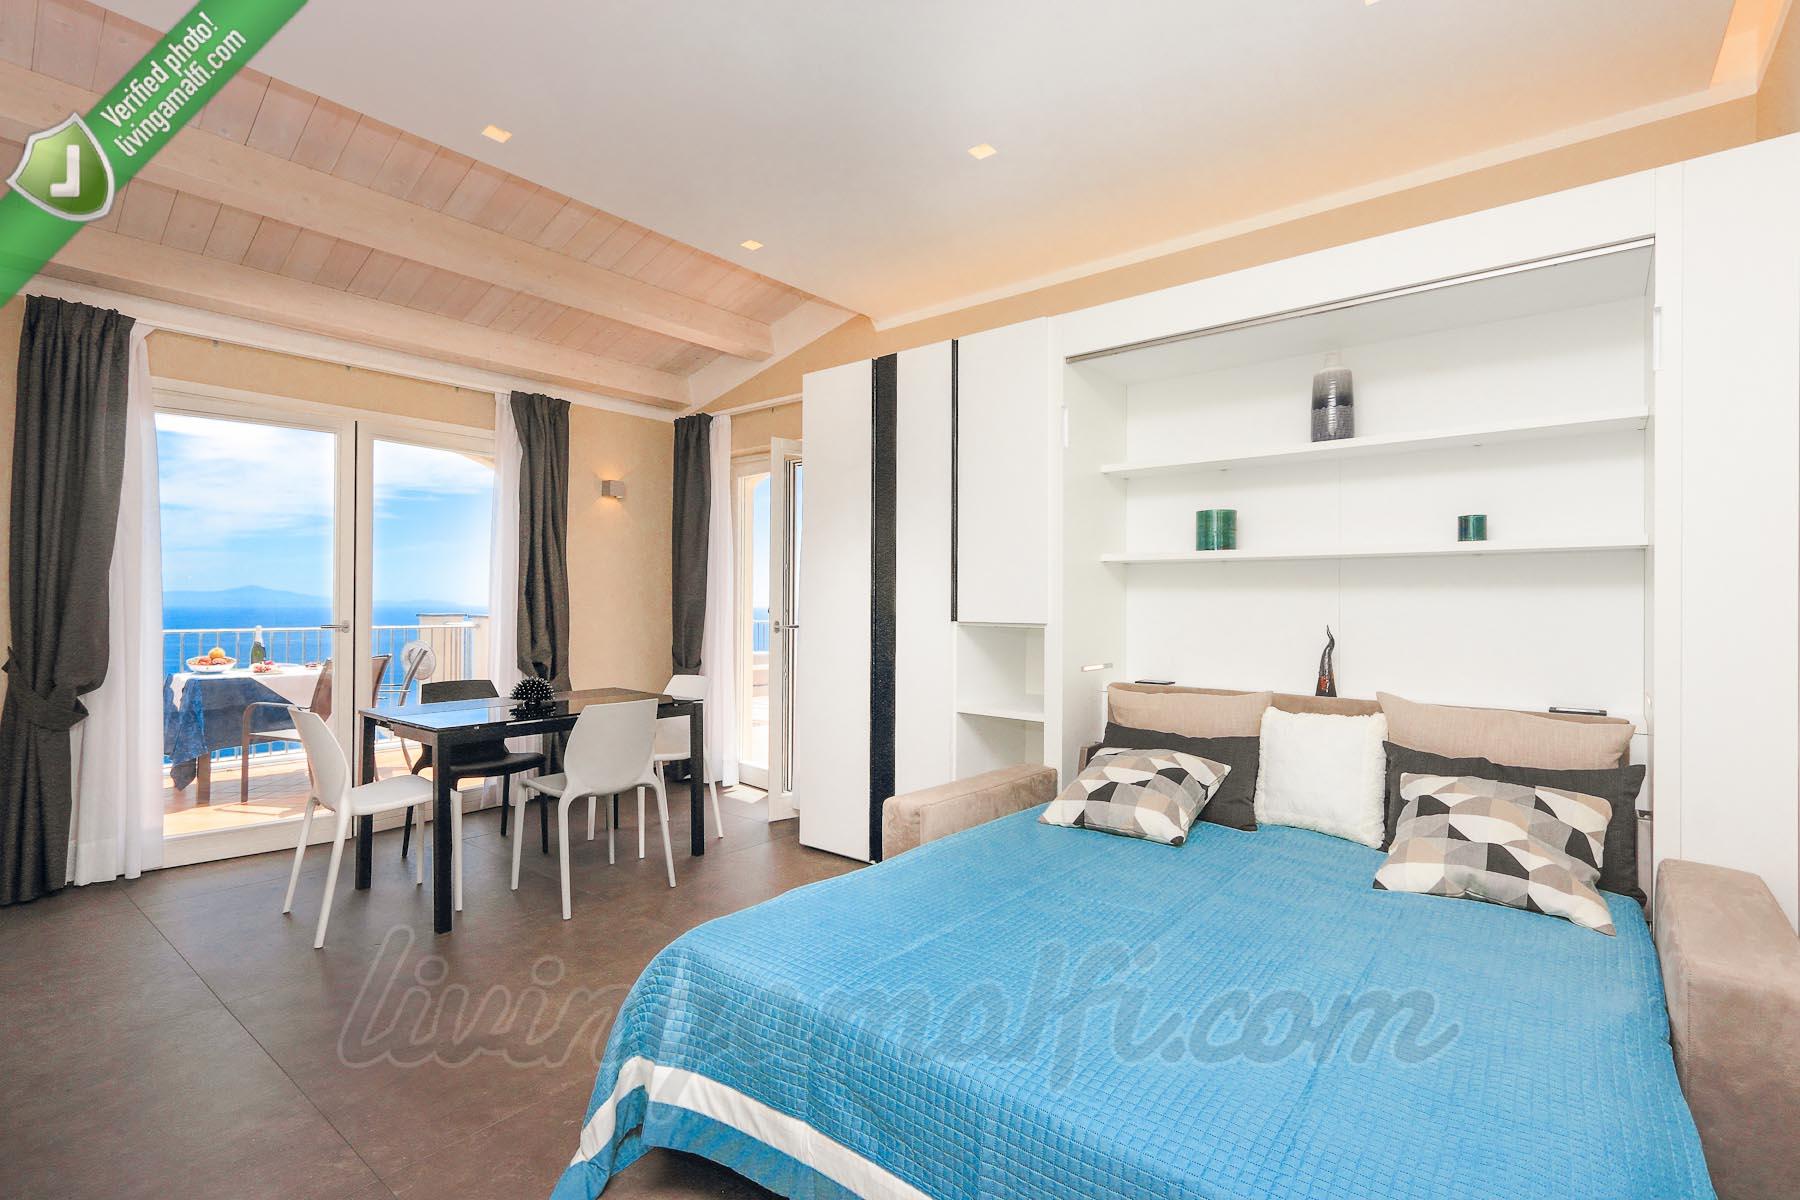 Apartment Zaffiro